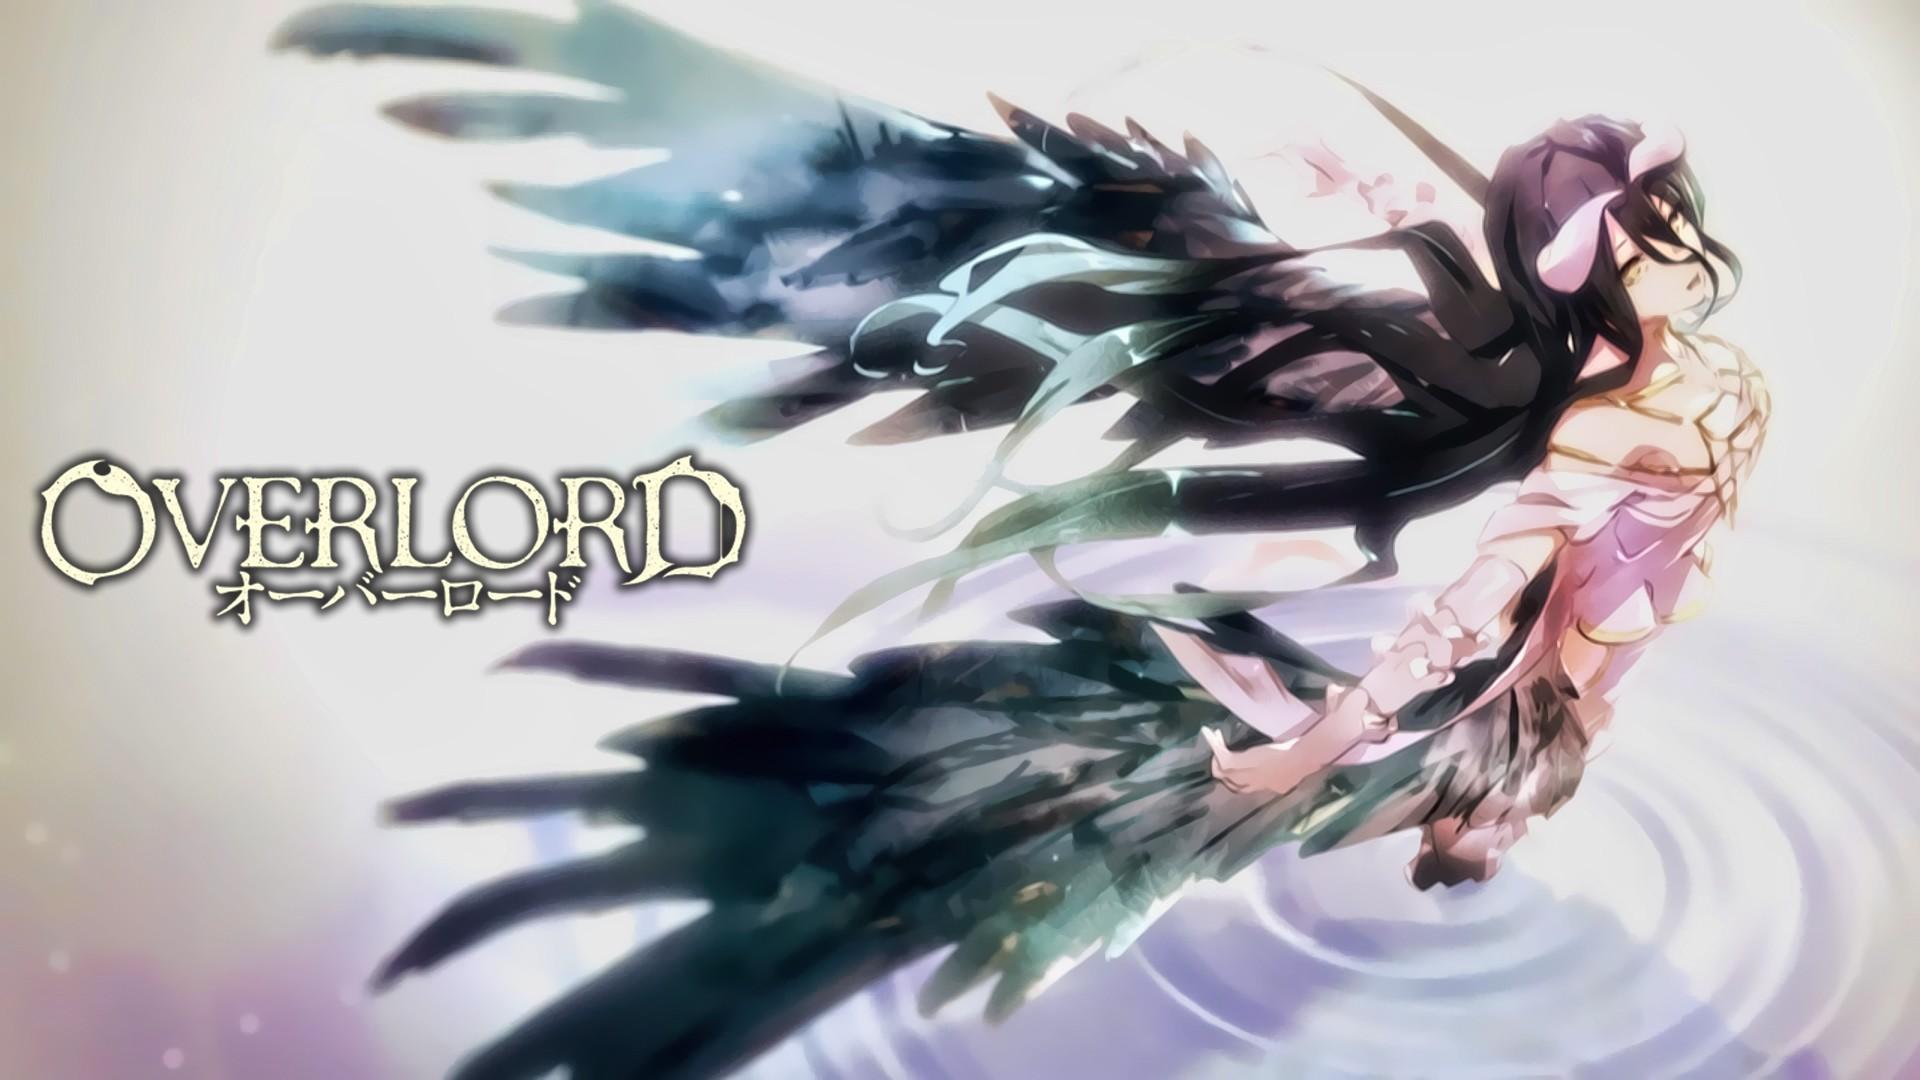 Download 43 Wallpaper Anime Overlord Hd HD Paling Keren